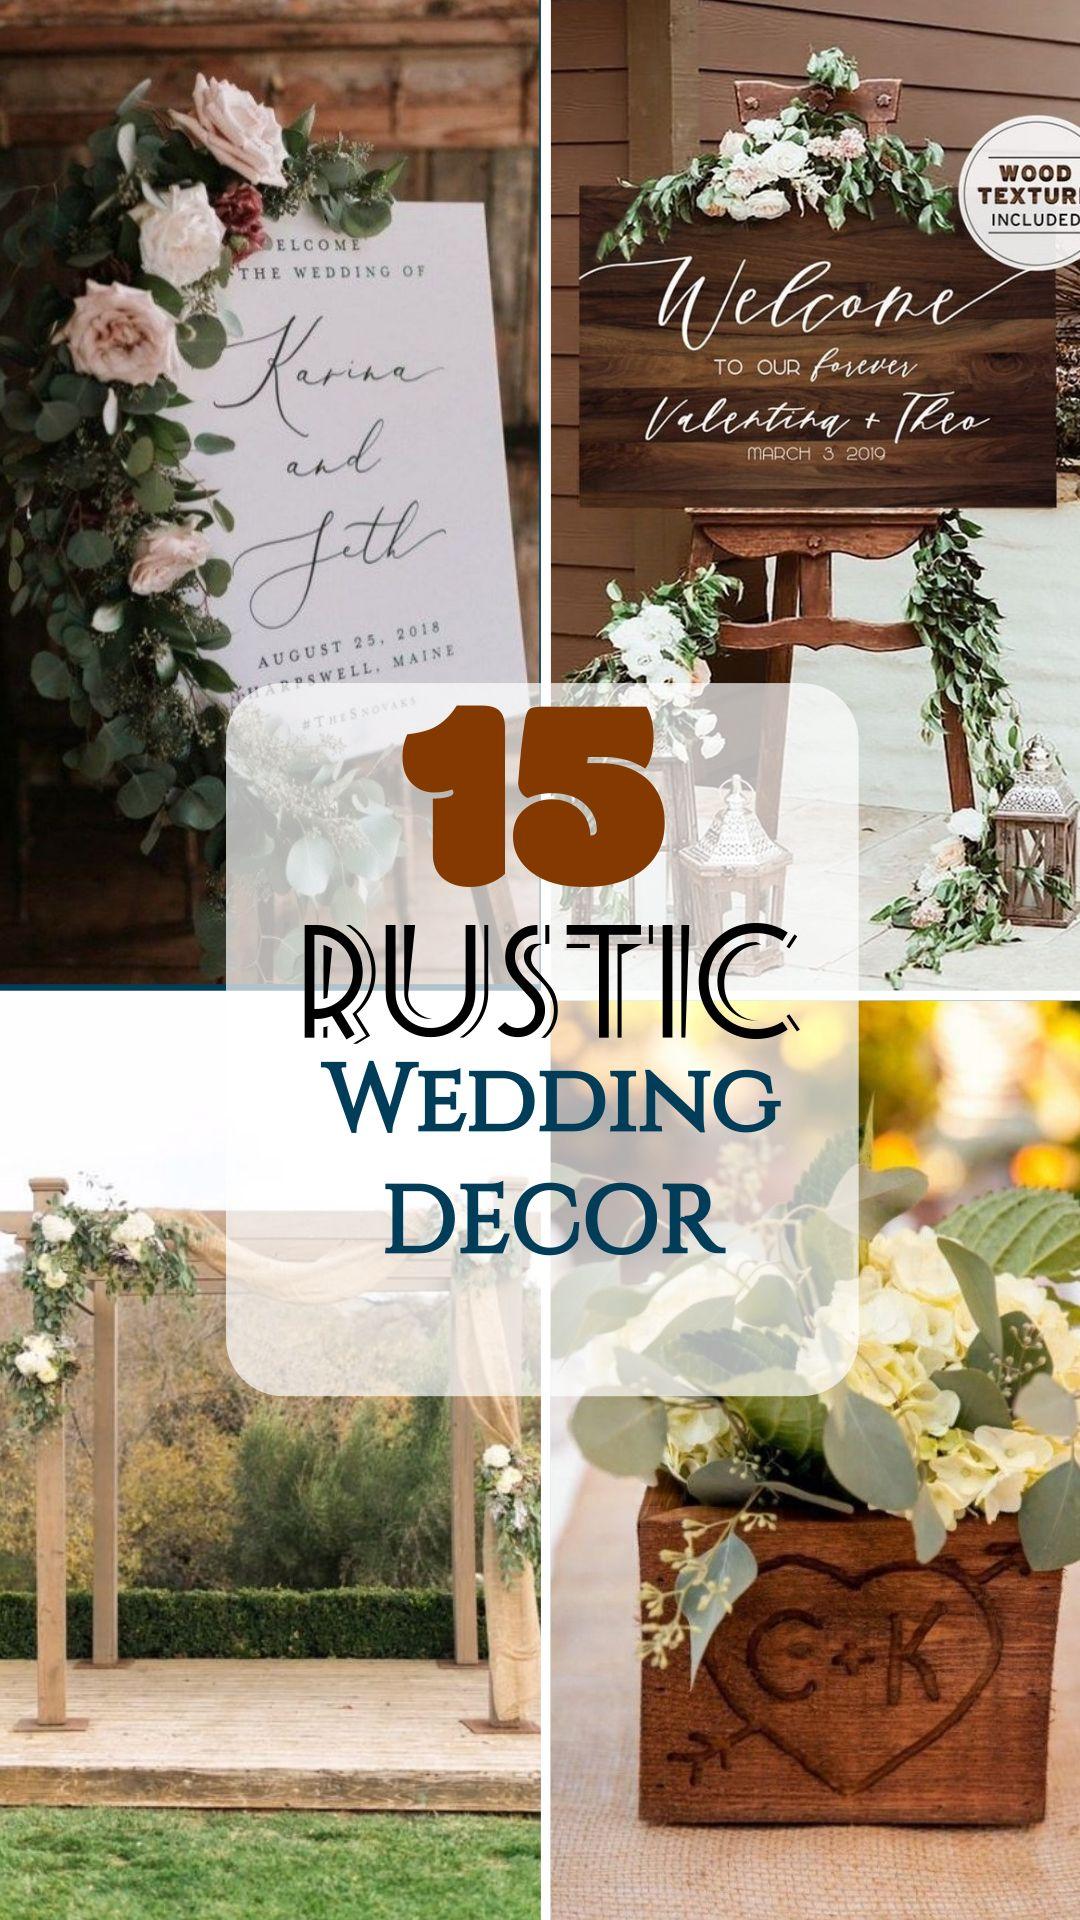 Rustic Wedding Decoration #weddingdecor